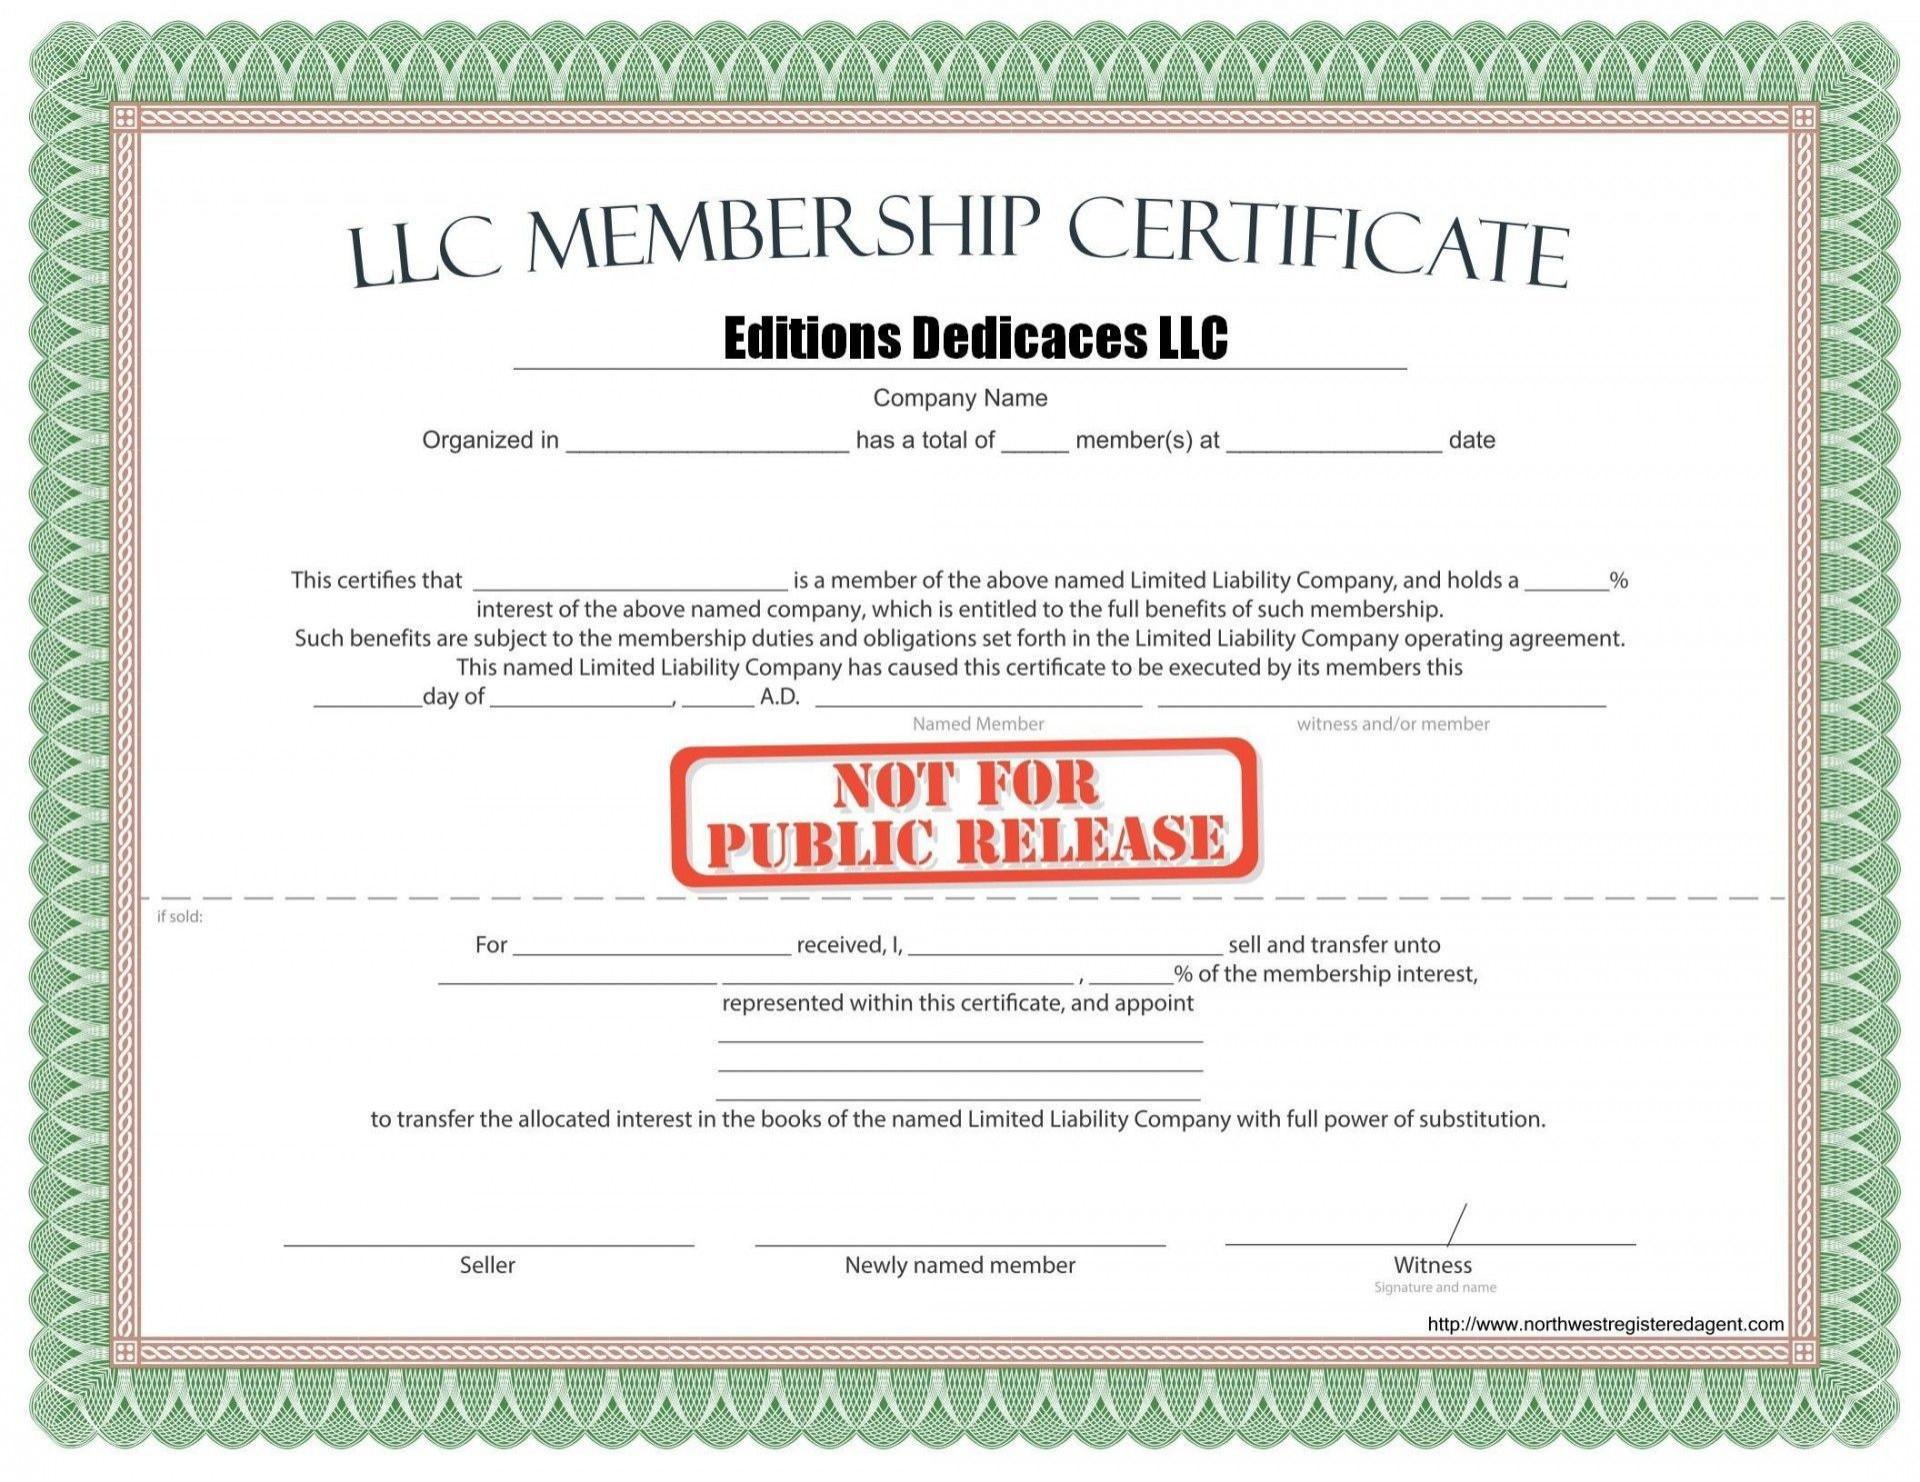 000 Phenomenal Llc Membership Certificate Template Inspiration  Interest Free Member1920